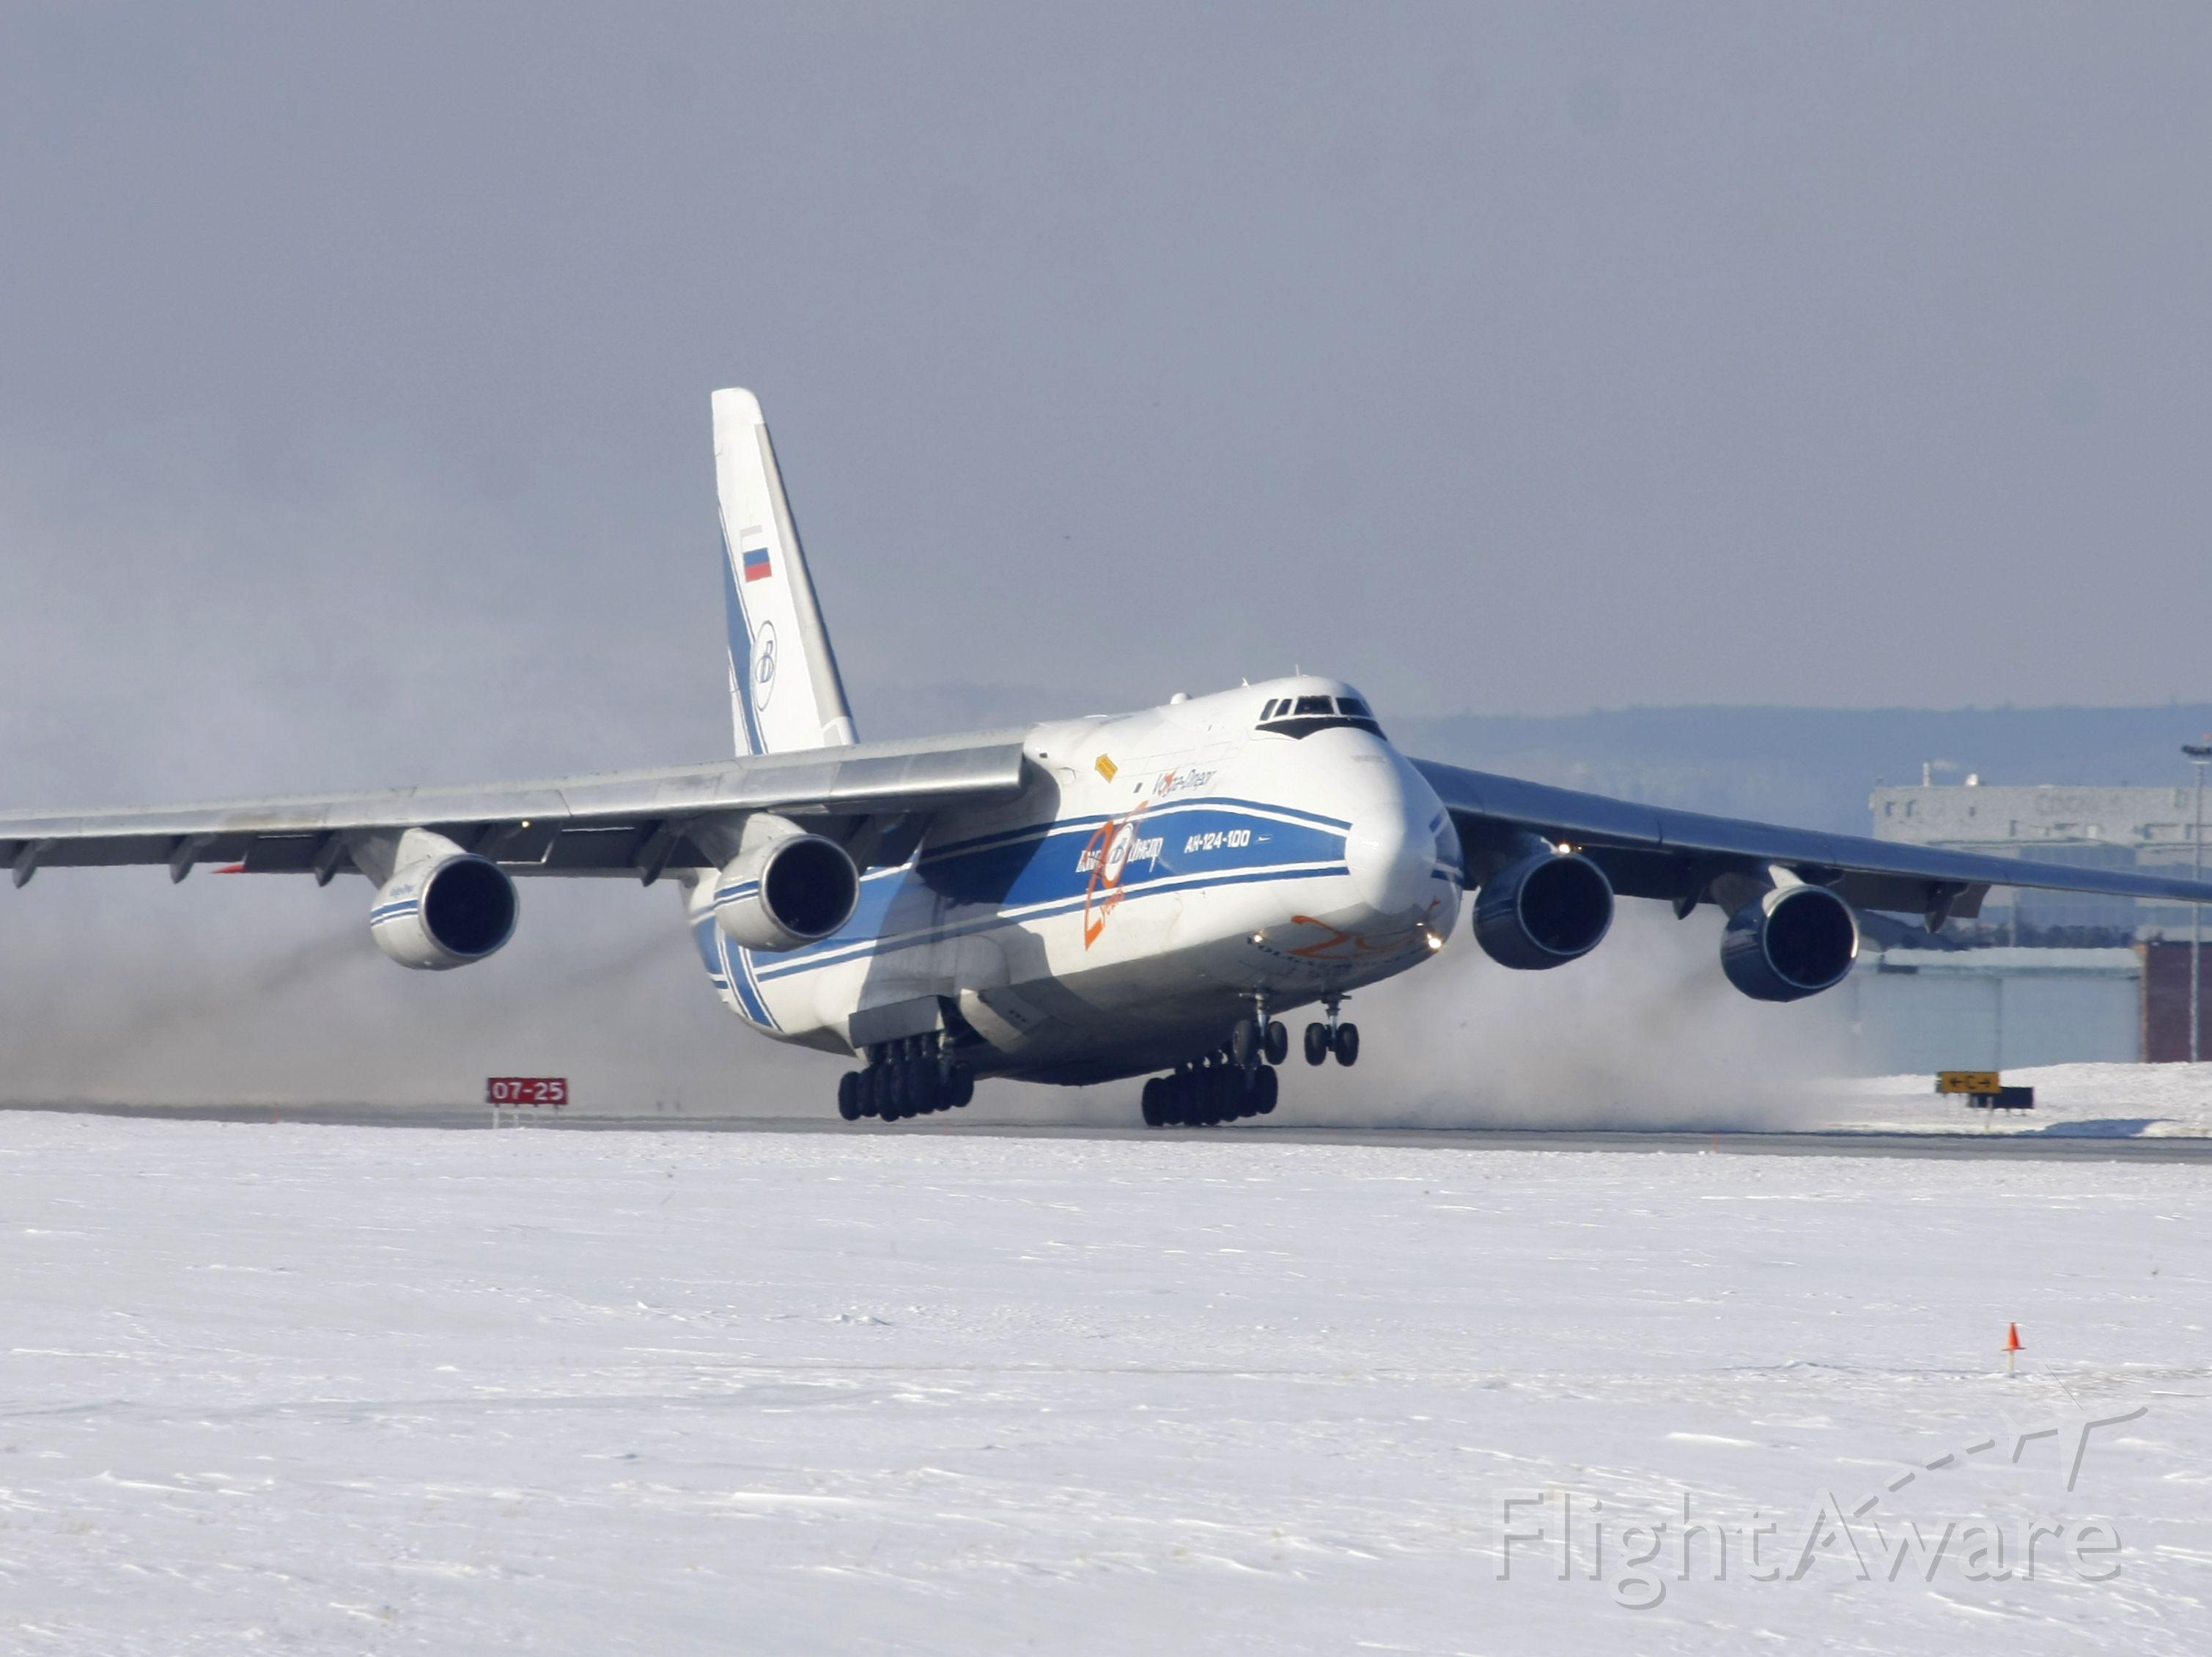 Antonov An-124 Ruslan (RNA82045) - The Russian Blizzard Maker lifting off Runway 14 on Feb 11, 2011 as flight VDA2118 to KNUQ